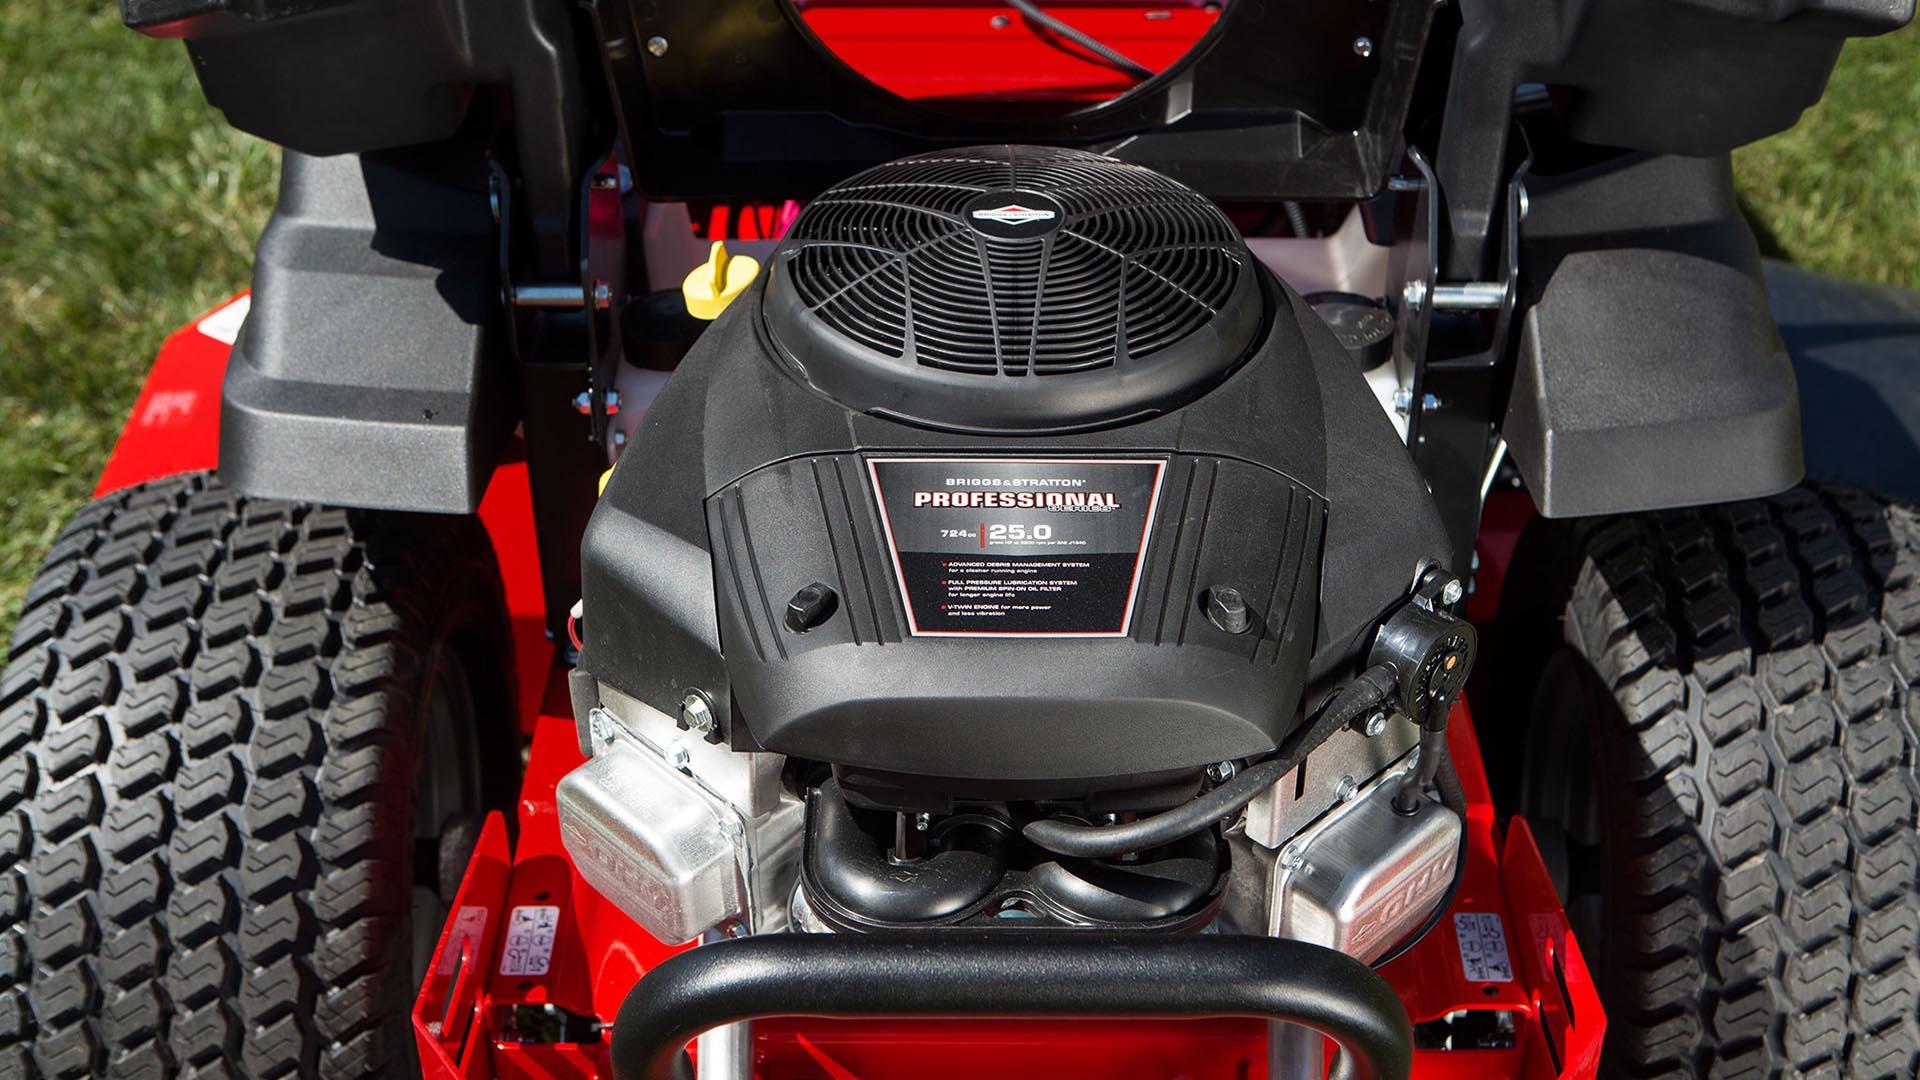 Toro Wheel Horse Lawn Mower Garden Tractor Throttle Control Cable 115392 114026